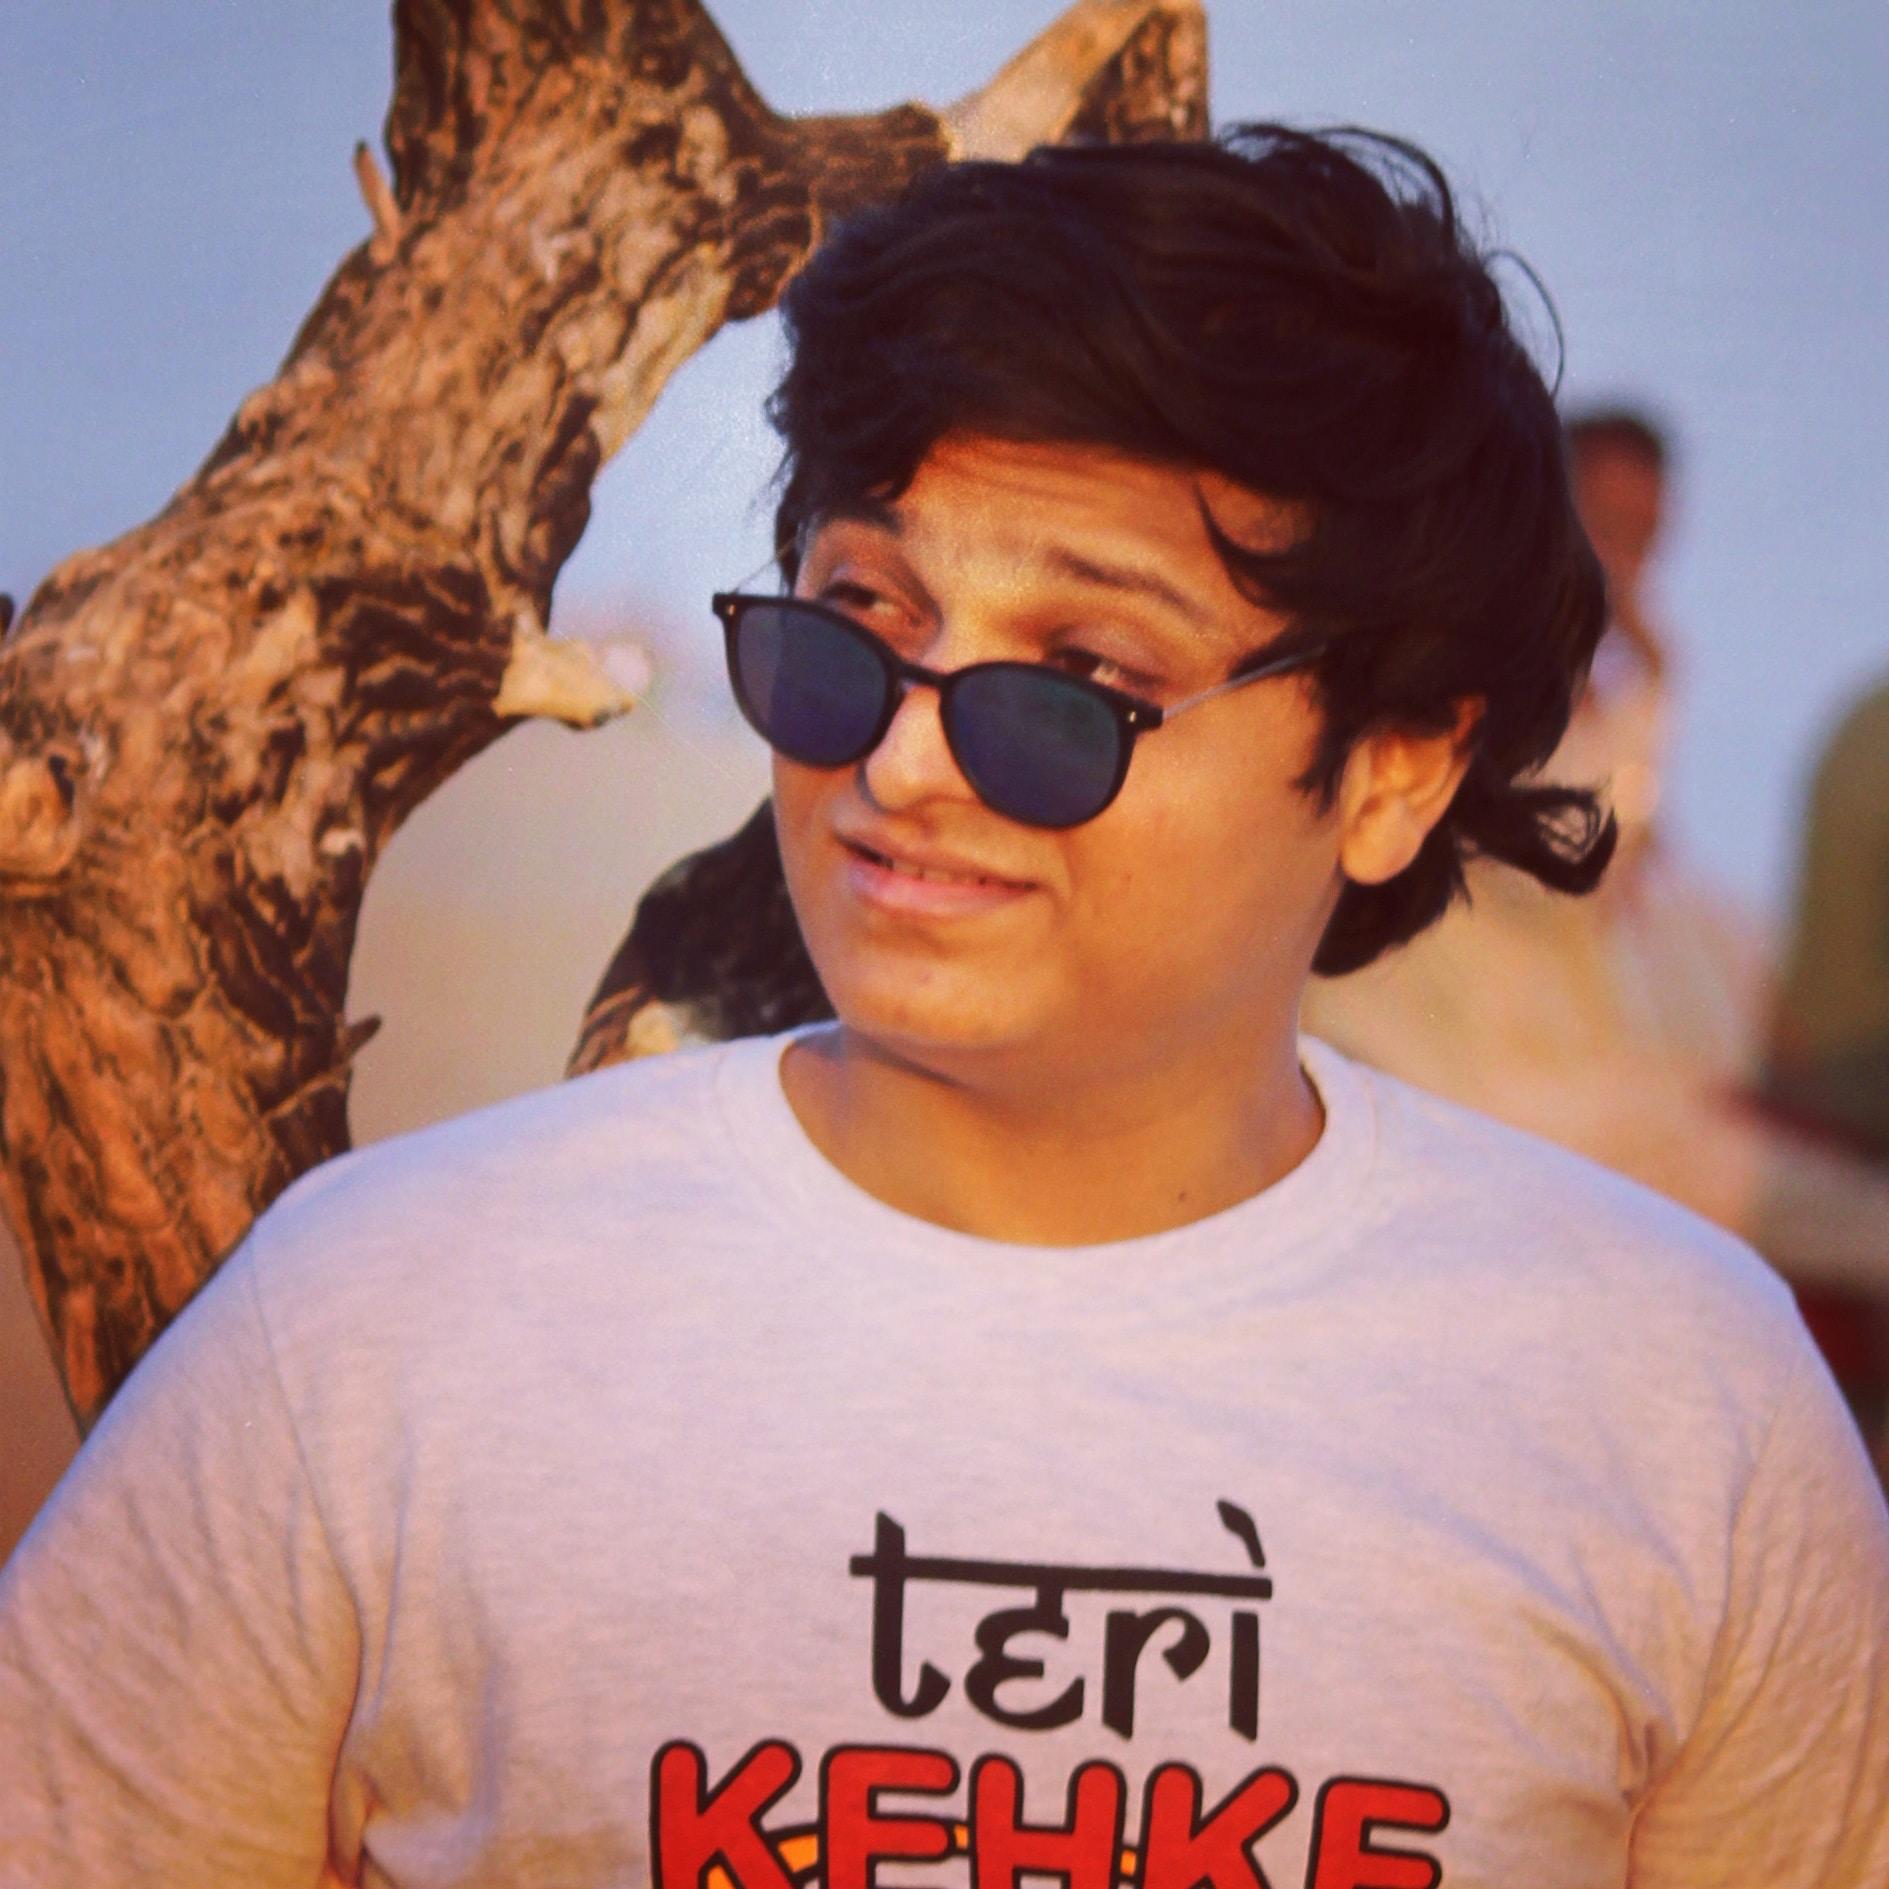 Go to Meet Shah's profile